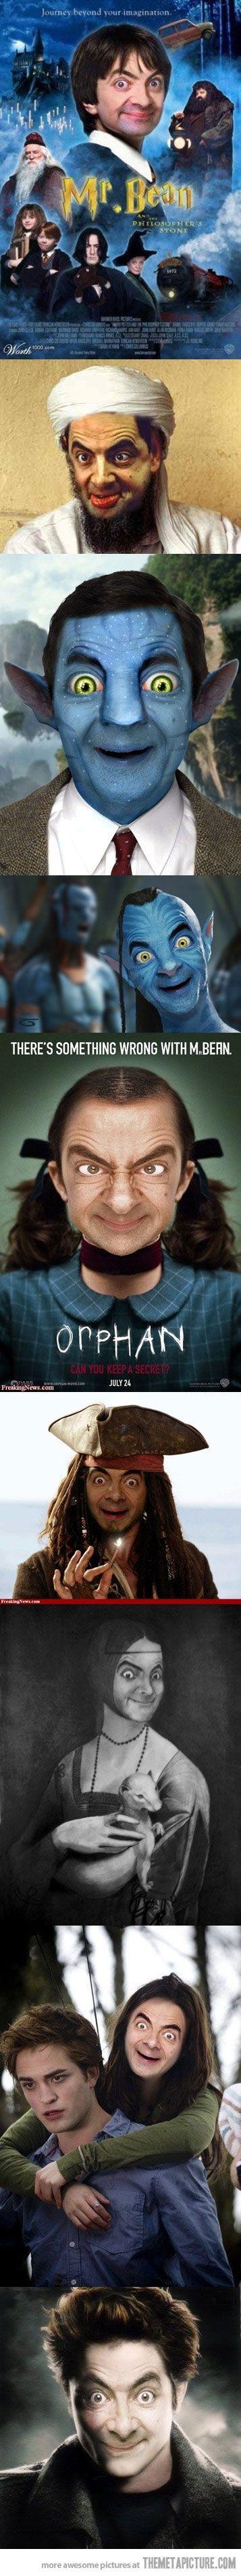 bahahahahahaha!!!Laughing So Hard, Make Me Laugh, Too Funny, Mrbean, So Funny, Mr Beans, Can'T Stop Laughing, Beans Strike, Rowan Atkinson